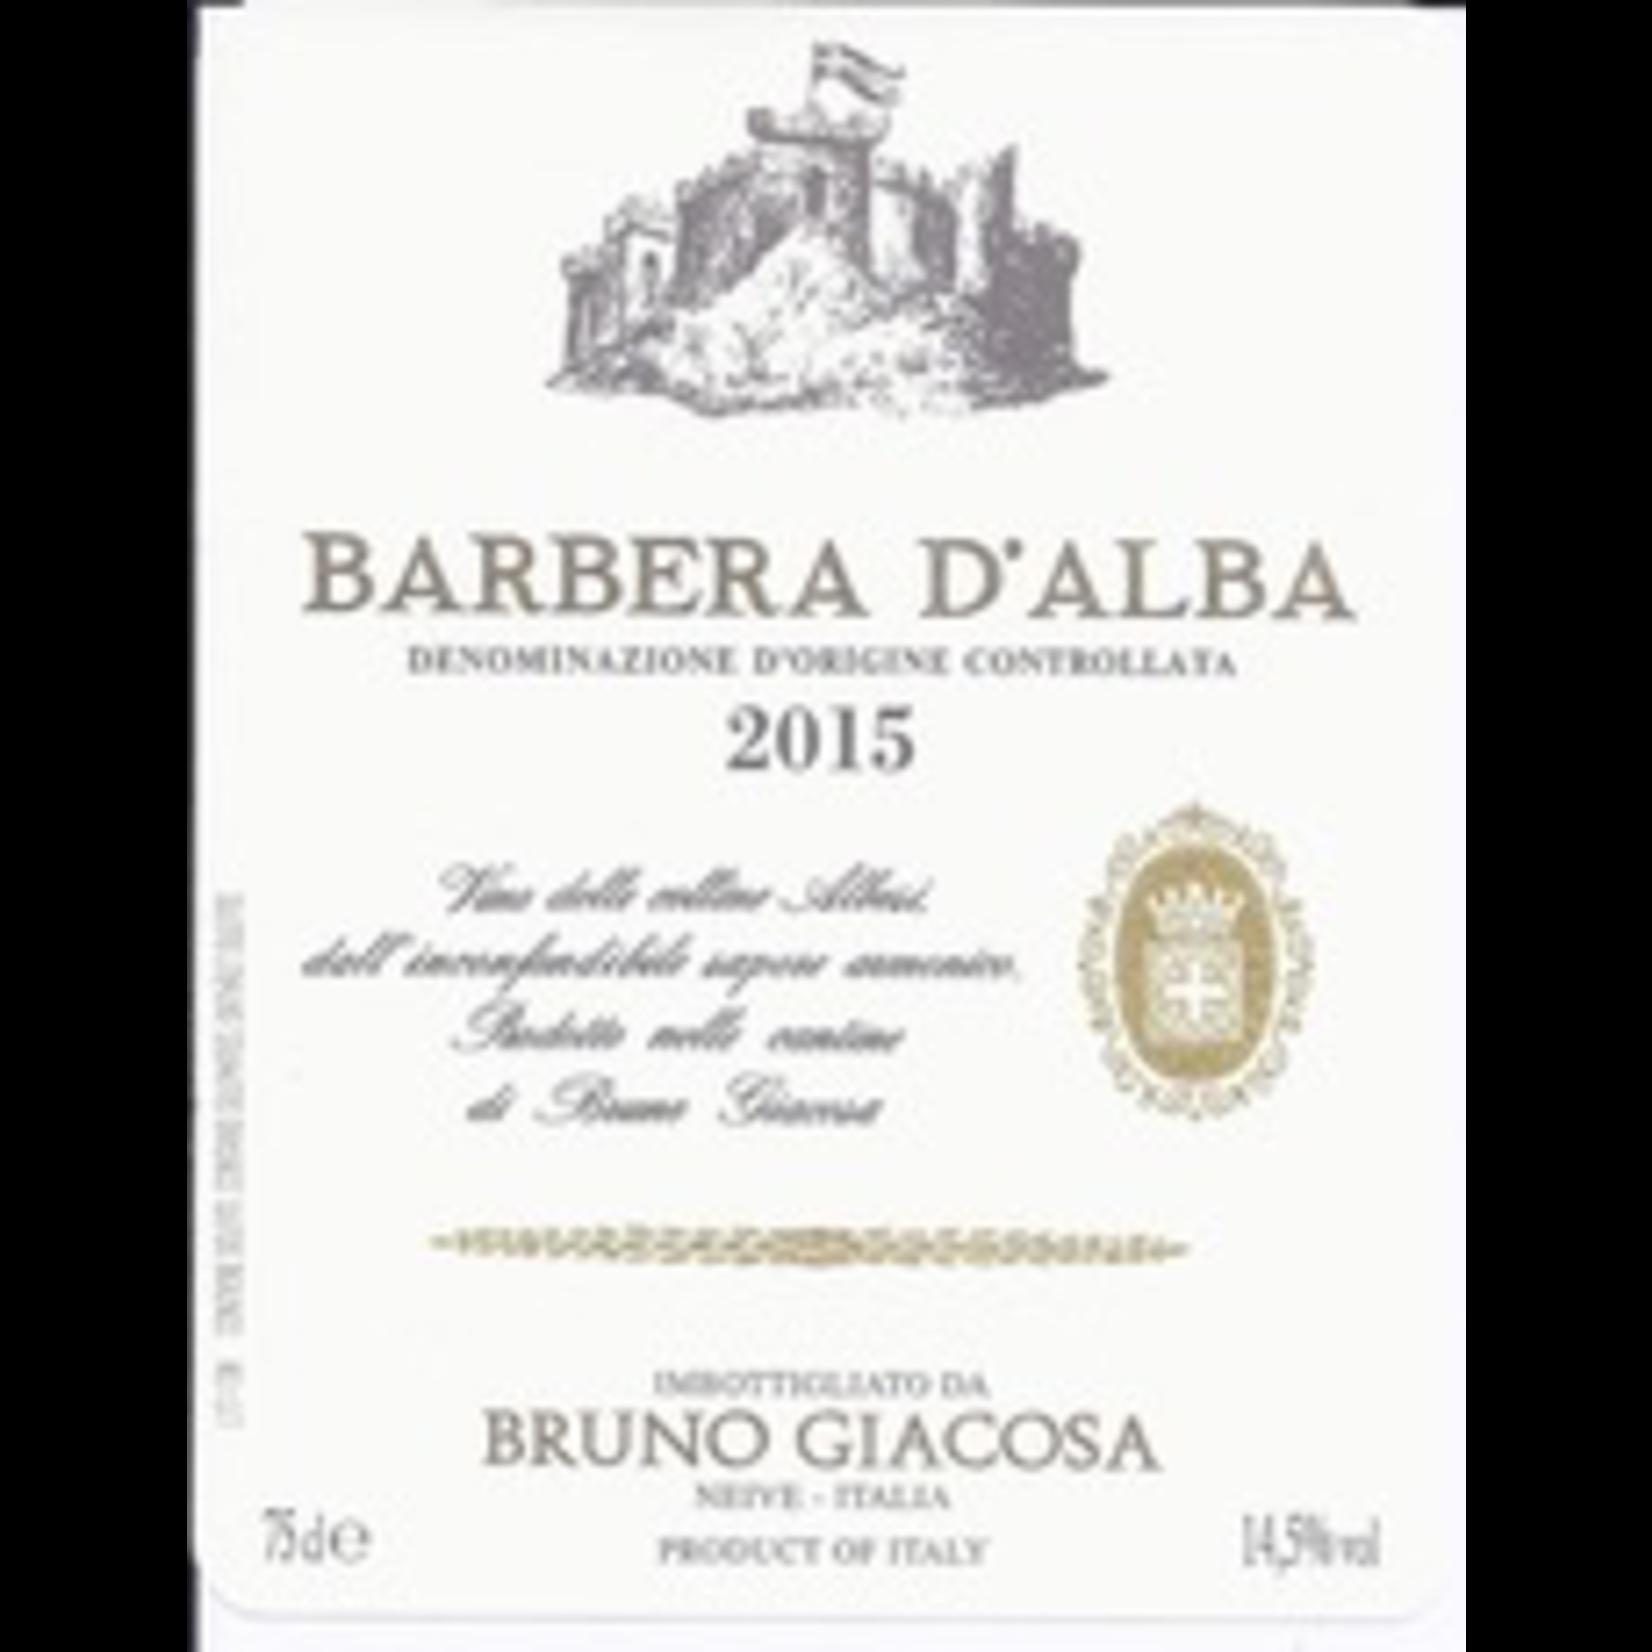 Bruno Giacosa Barbera d'Alba 2018